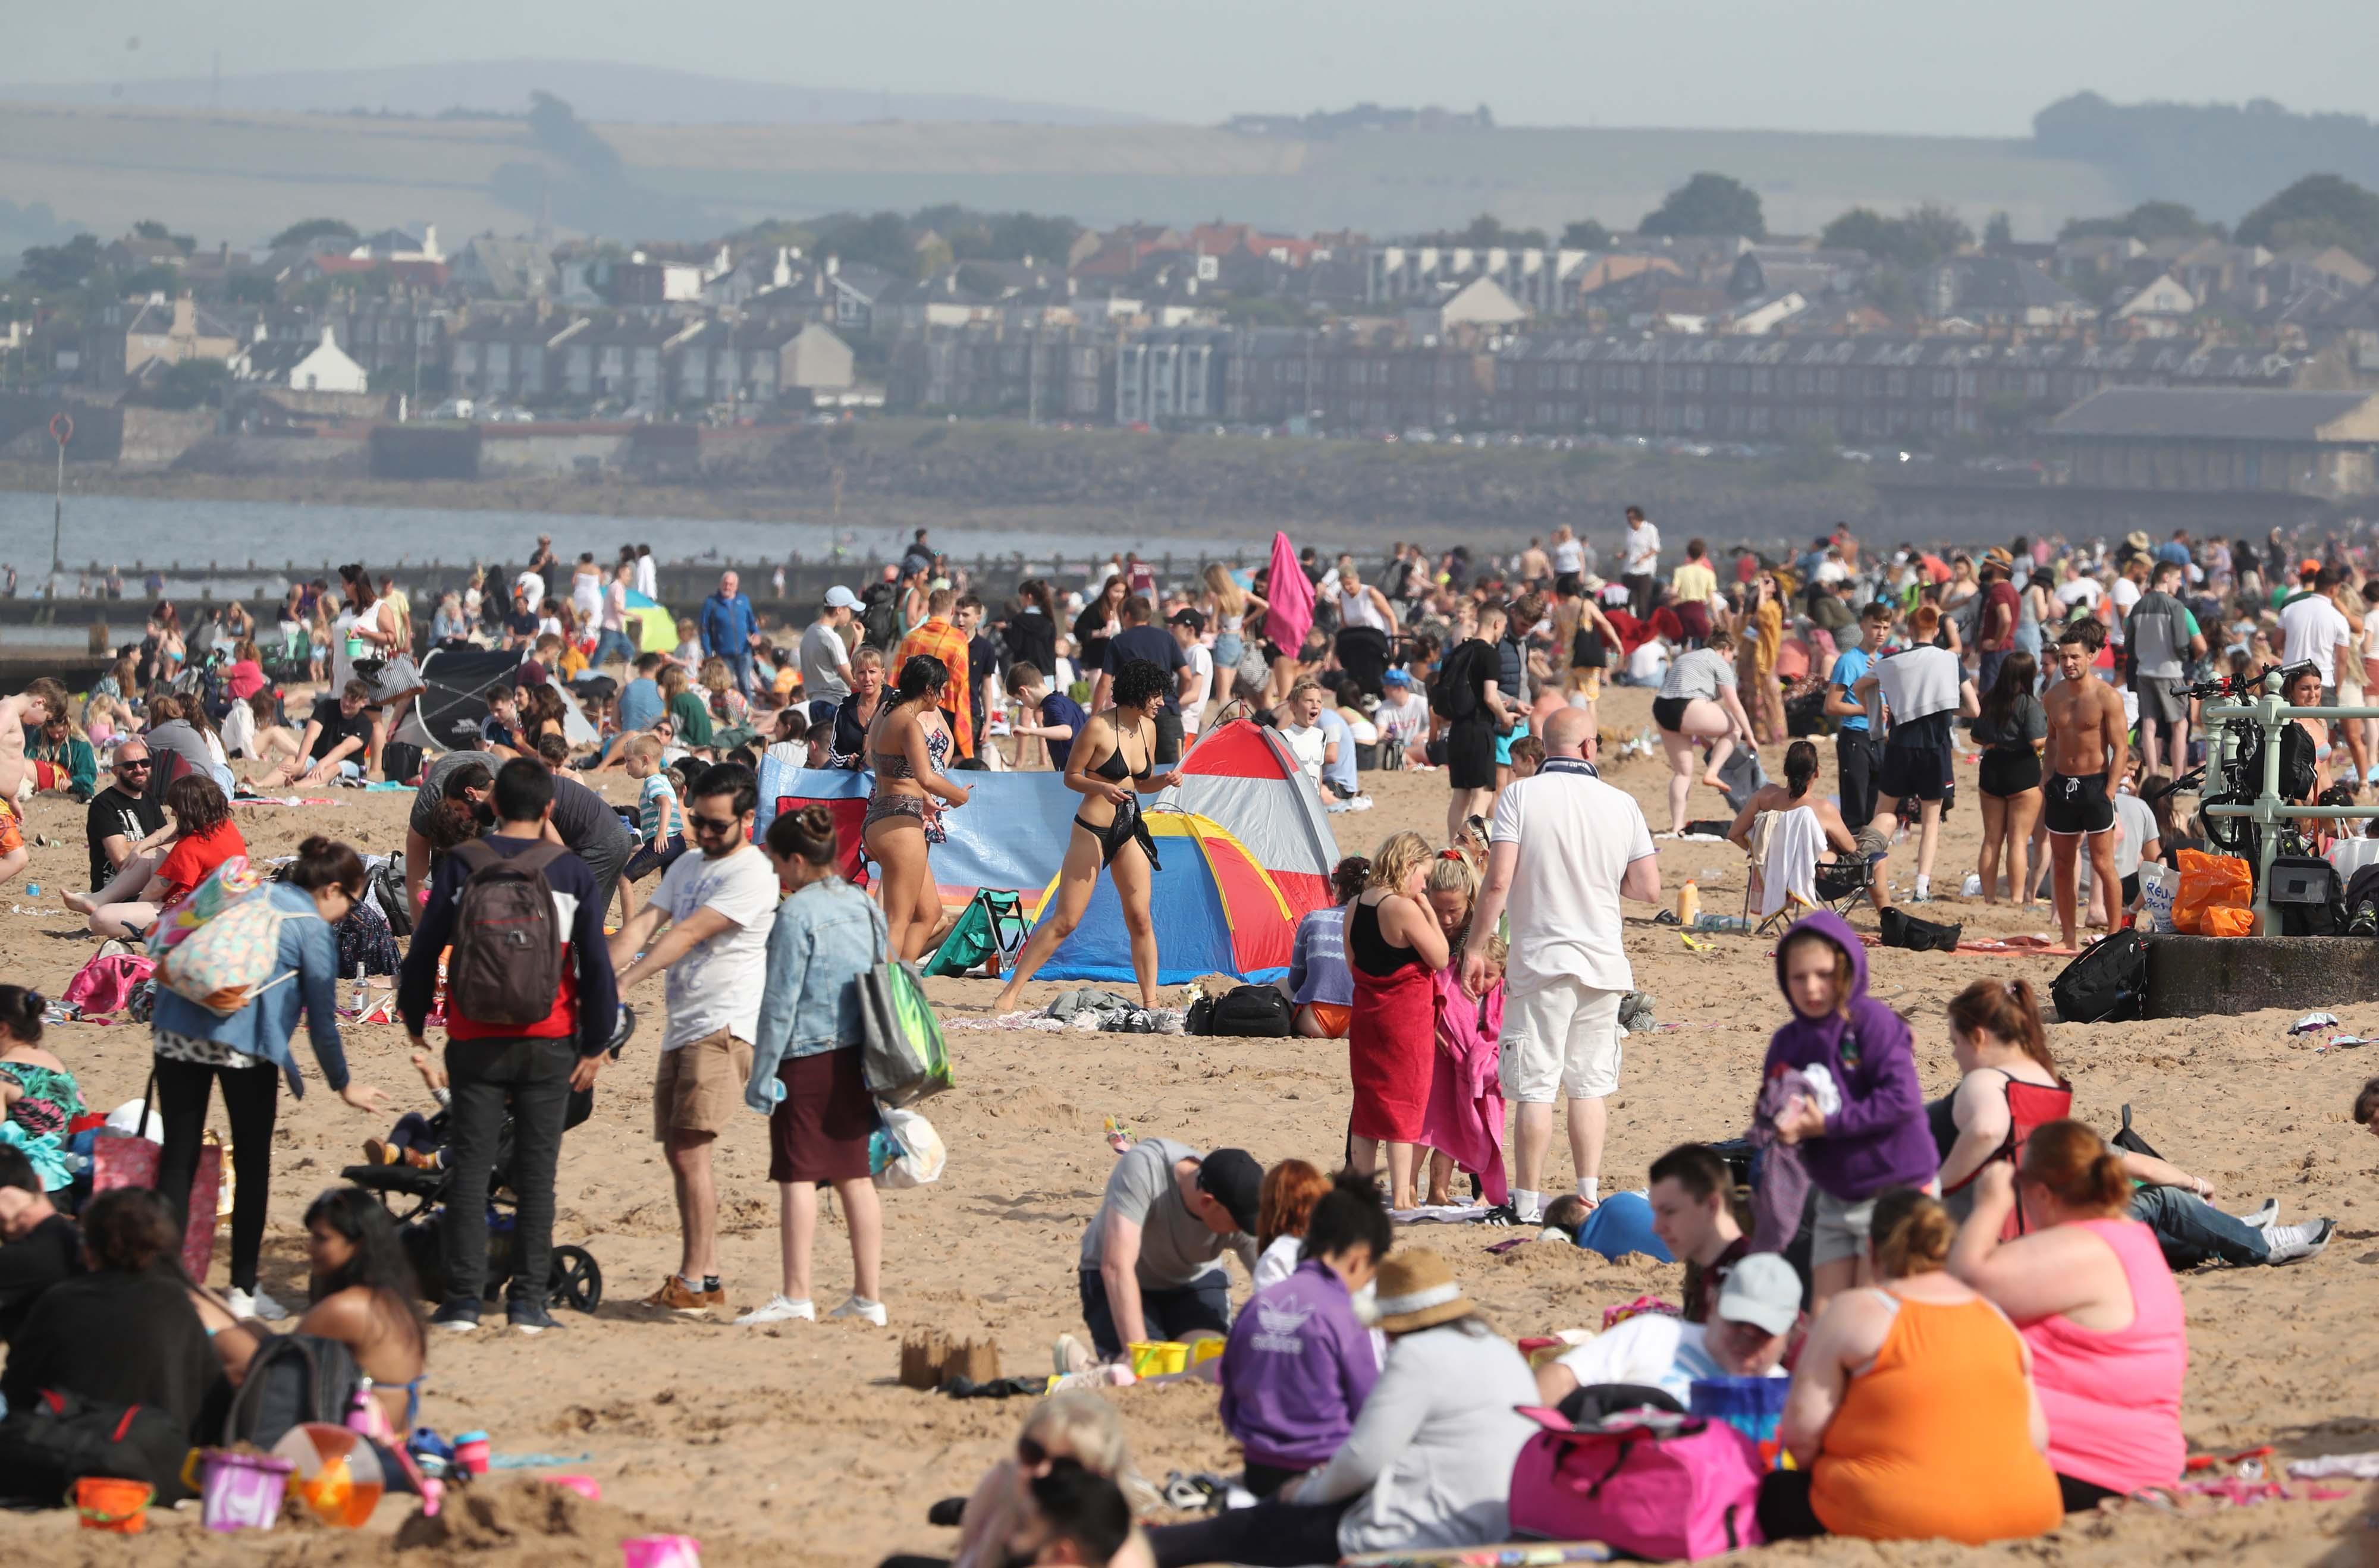 People enjoying the weather on Portobello Beach in Edinburgh.